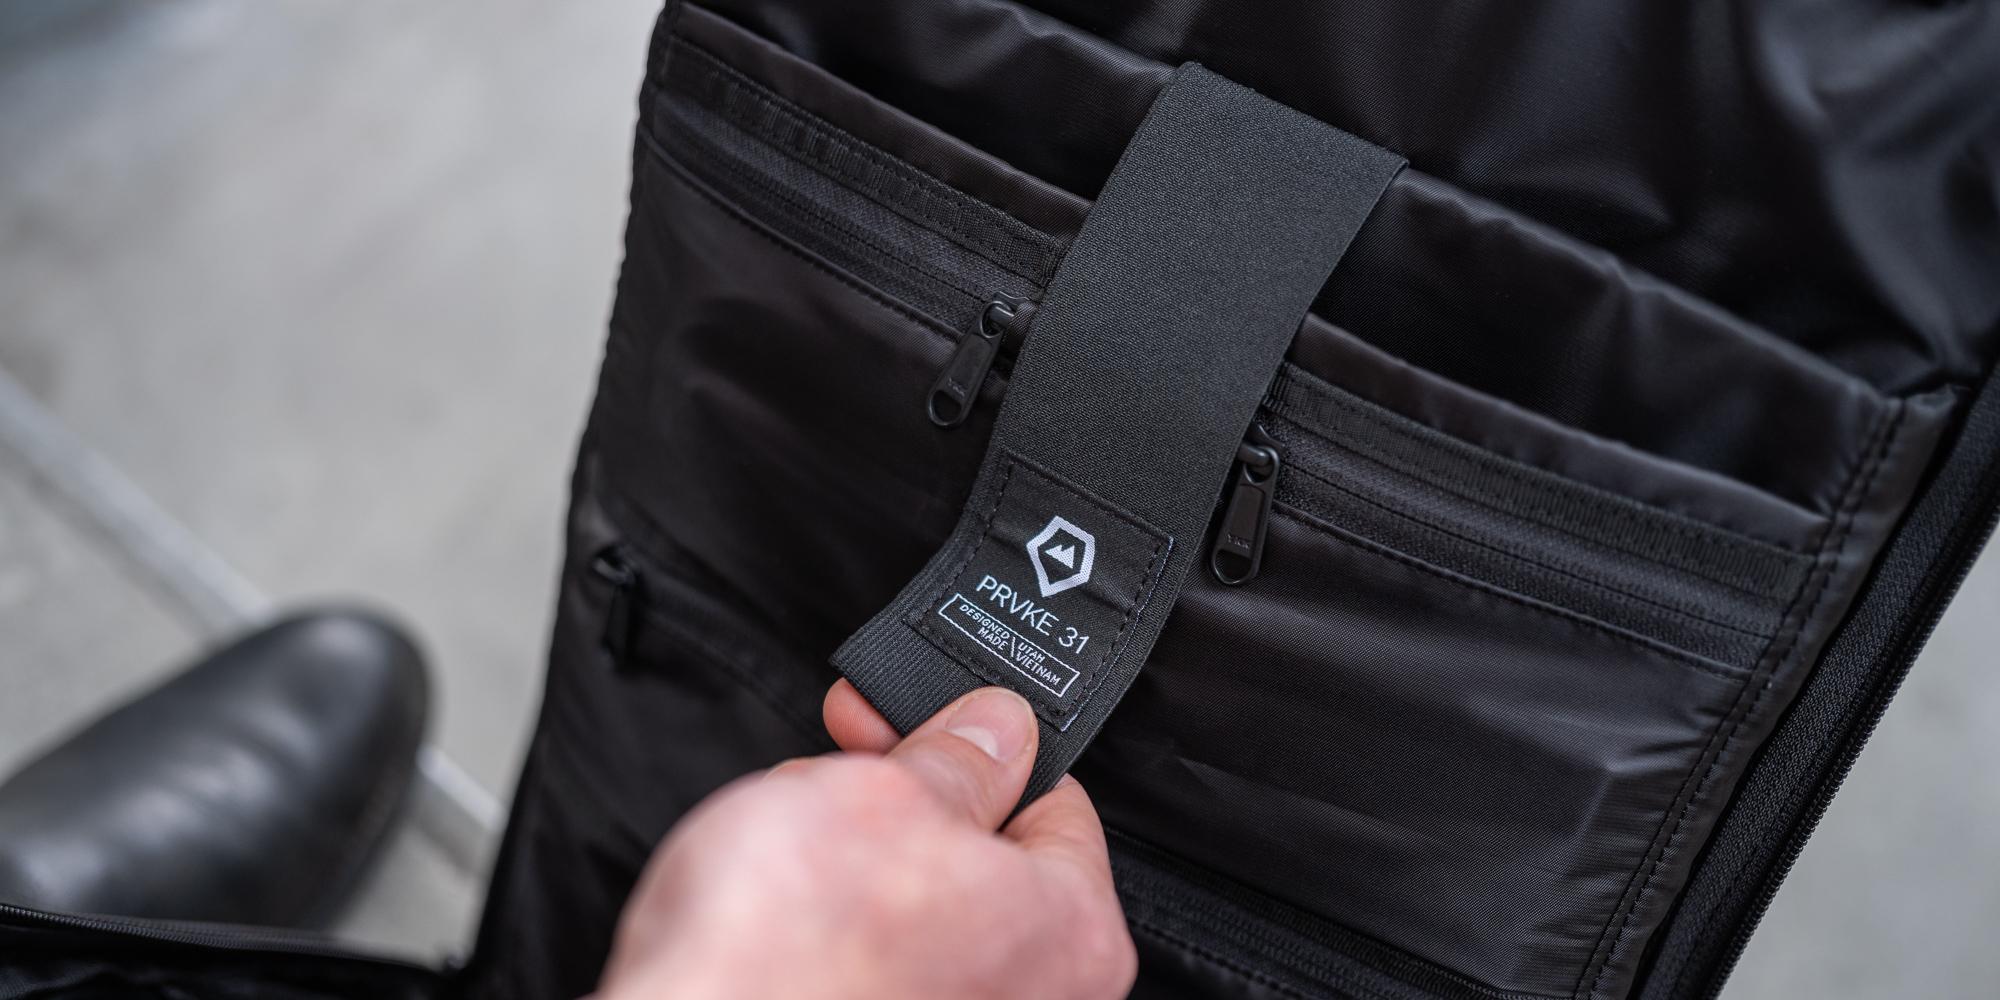 Wandrd All-new Prvke 21 Photo Bundle Essential Backpack - Fully customizable